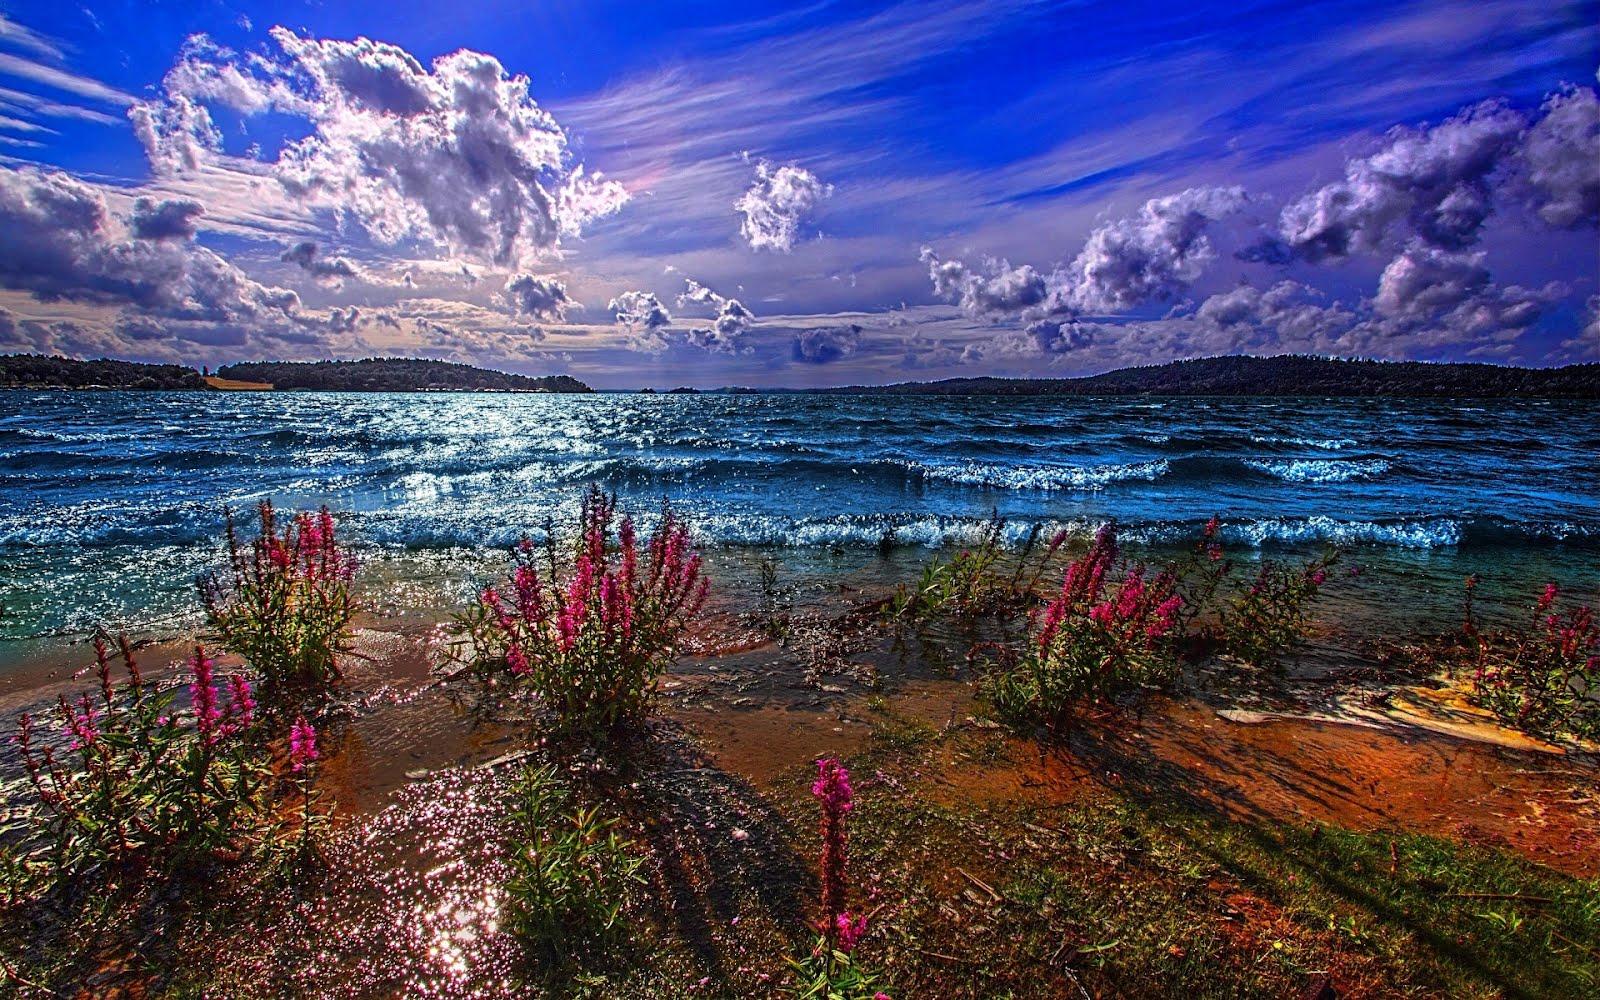 Imágenes motivadoras de paisajes Imagenes tiernas para  - Imagenes De Paisajes Tristes